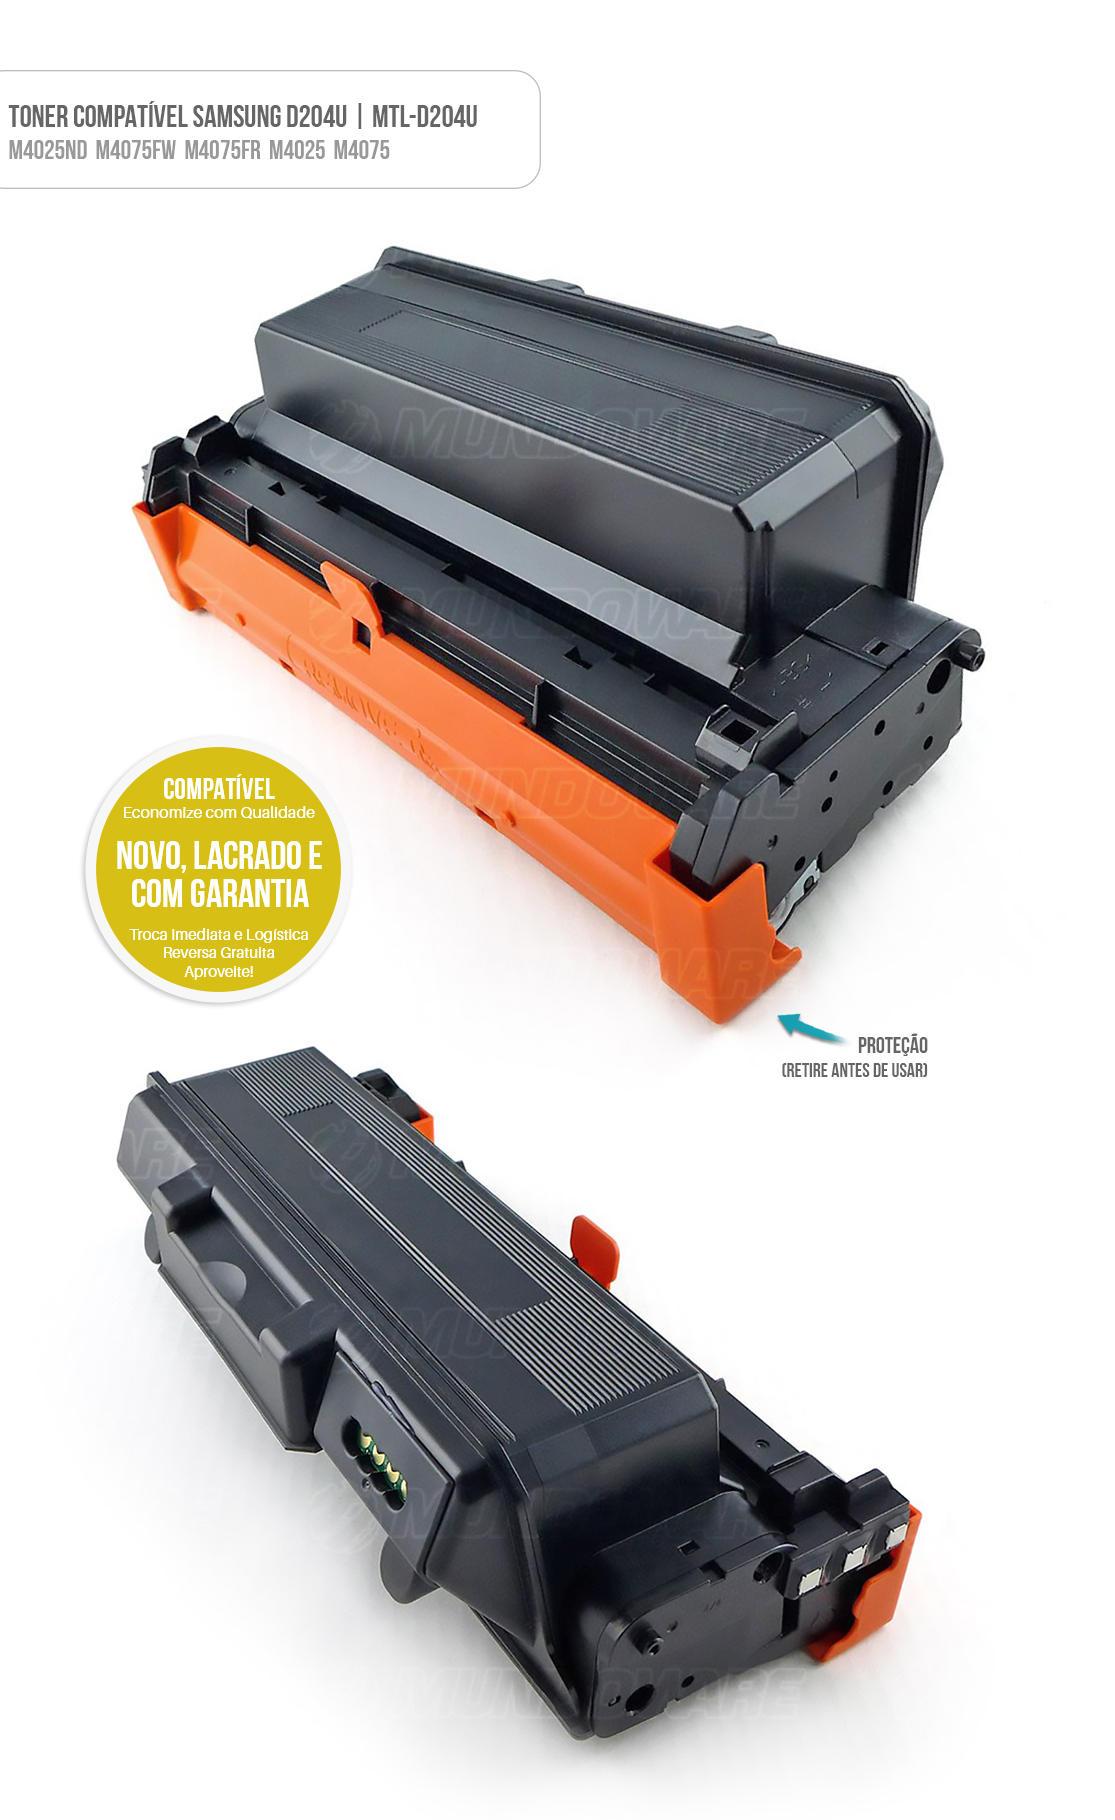 Toner para impressora M4025ND M4075FW M4075FR M4025 M4075 M 4025ND M 4075FW M 4075FR M 4025 M 4075 tonner D204U 15k